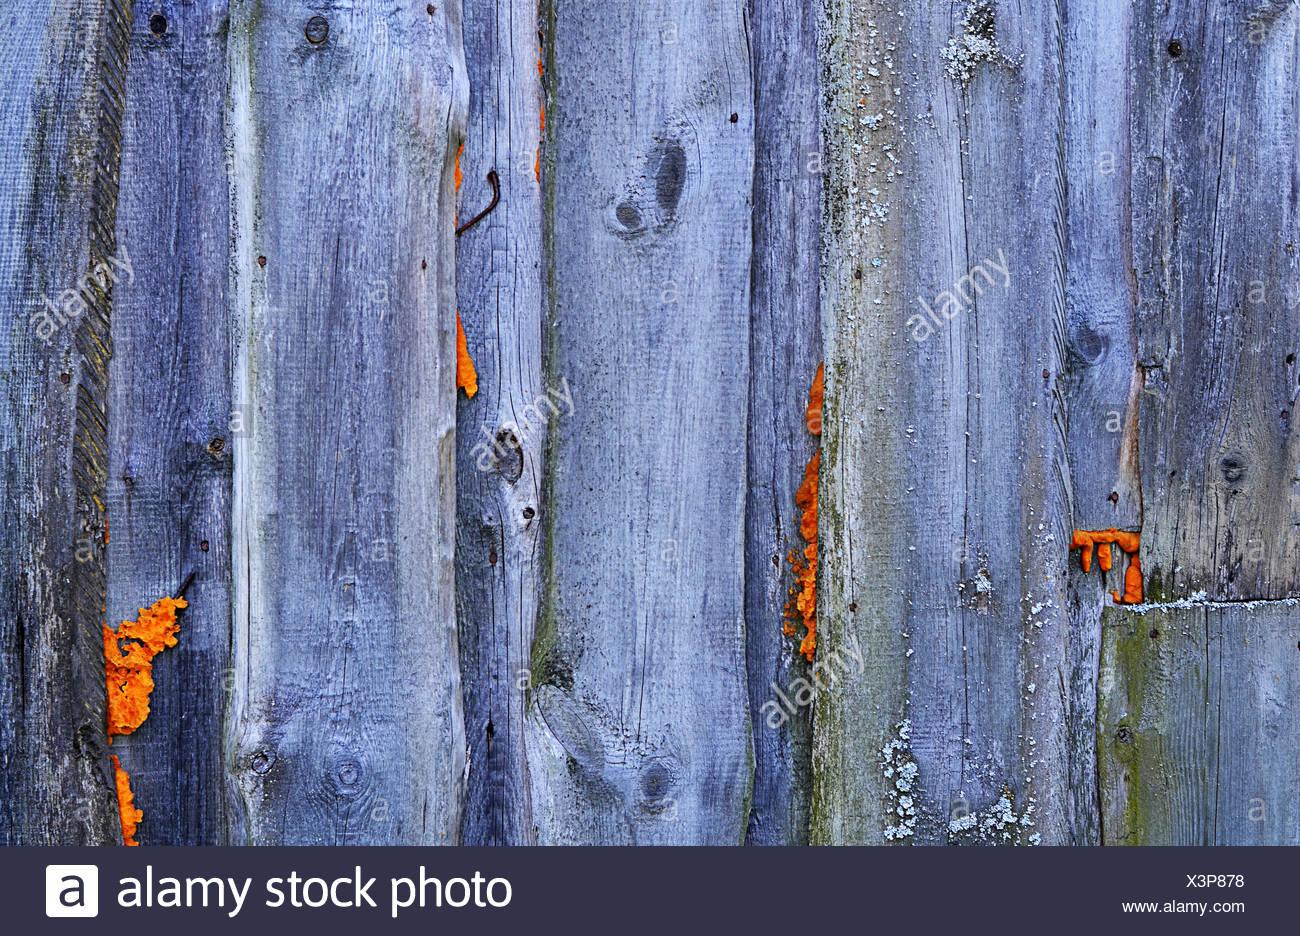 Zaun Aus Holzbrettern Hautnah Stockfoto Bild 277699276 Alamy